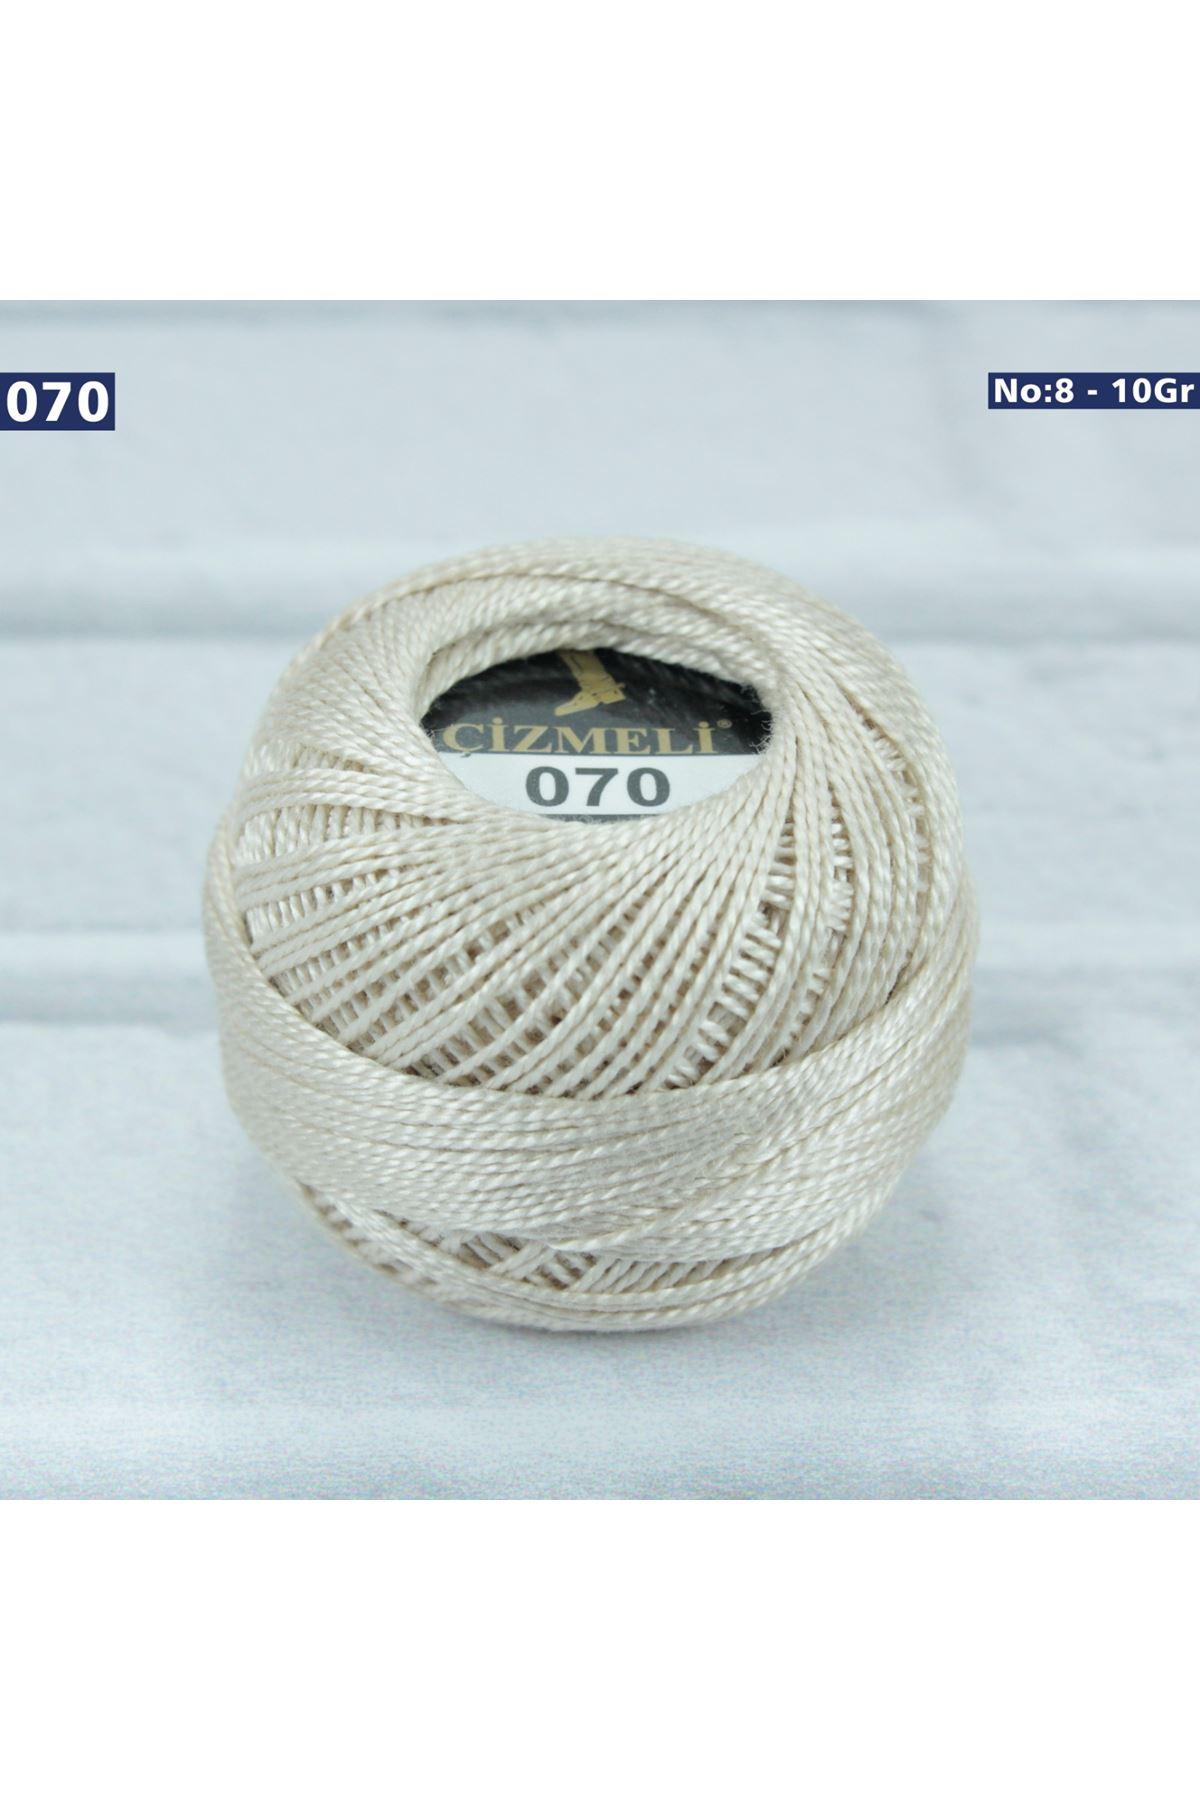 Çizmeli Cotton Perle Nakış İpliği No: 070